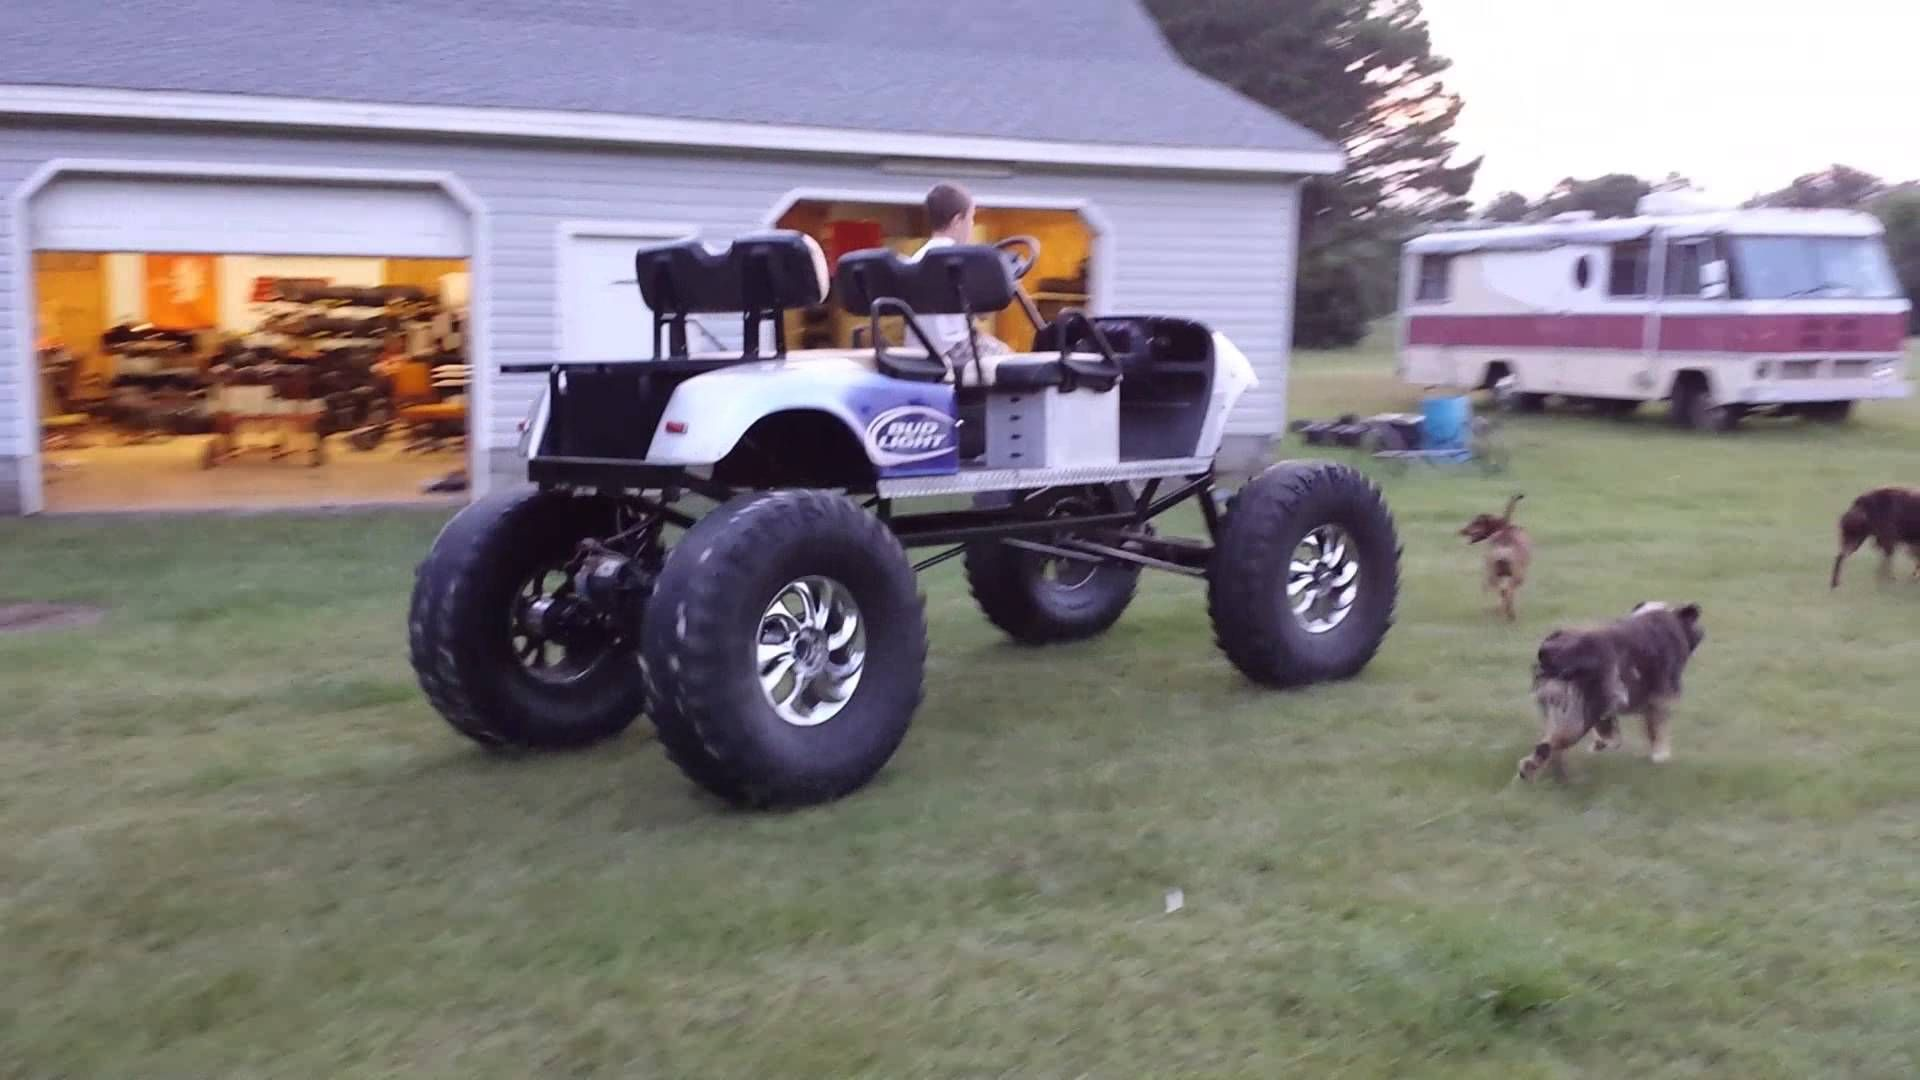 lifted monster ez go golf cart on 39 5 tires [ 1920 x 1080 Pixel ]